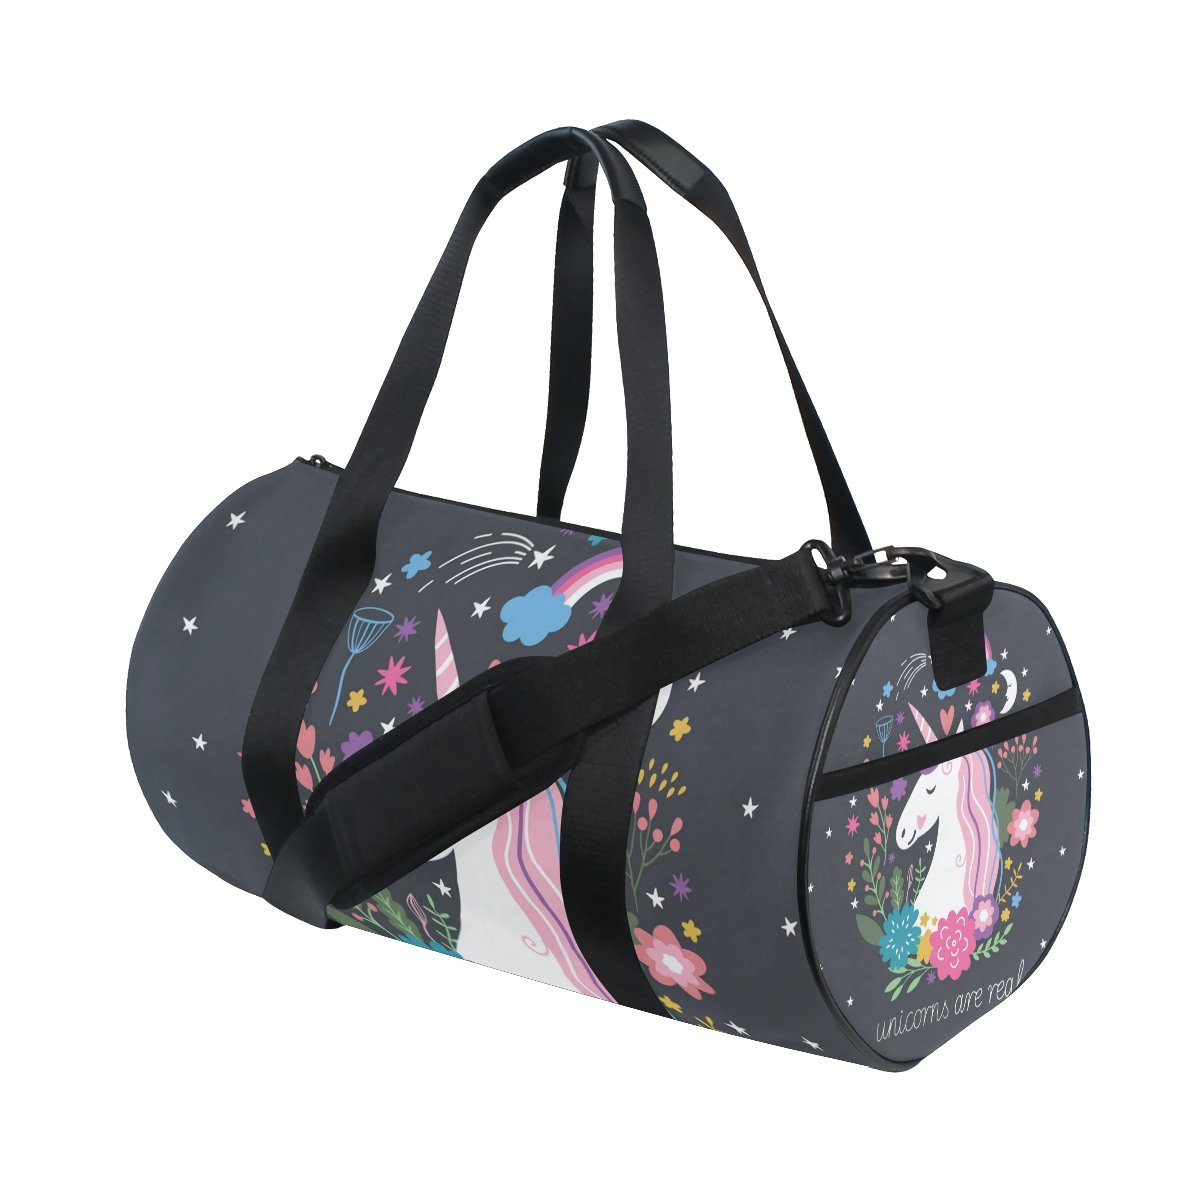 ALIREA Unicorn Duffle bag Shoulder Handy Sports Gym Bags for Men and Women